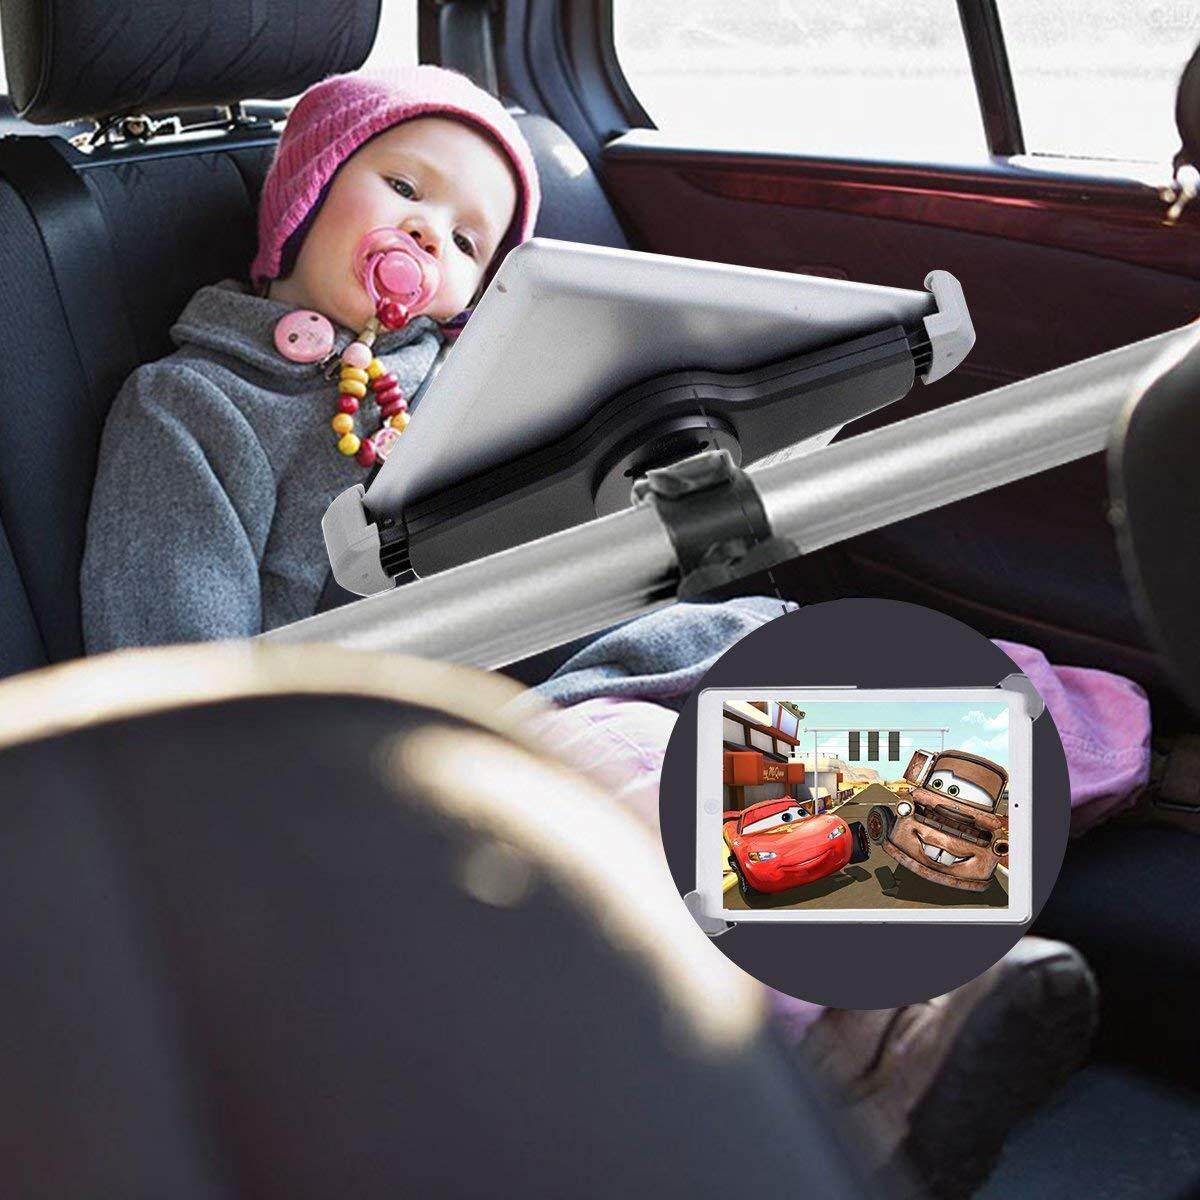 CEStore Airflow Design in-car Backseat Headrest Spring Loaded Telescopic Arm Extendable Mount Holder Universal in-car Back Seat Portrait Landscape View Mount Tablet Laptop PC Holder Stand